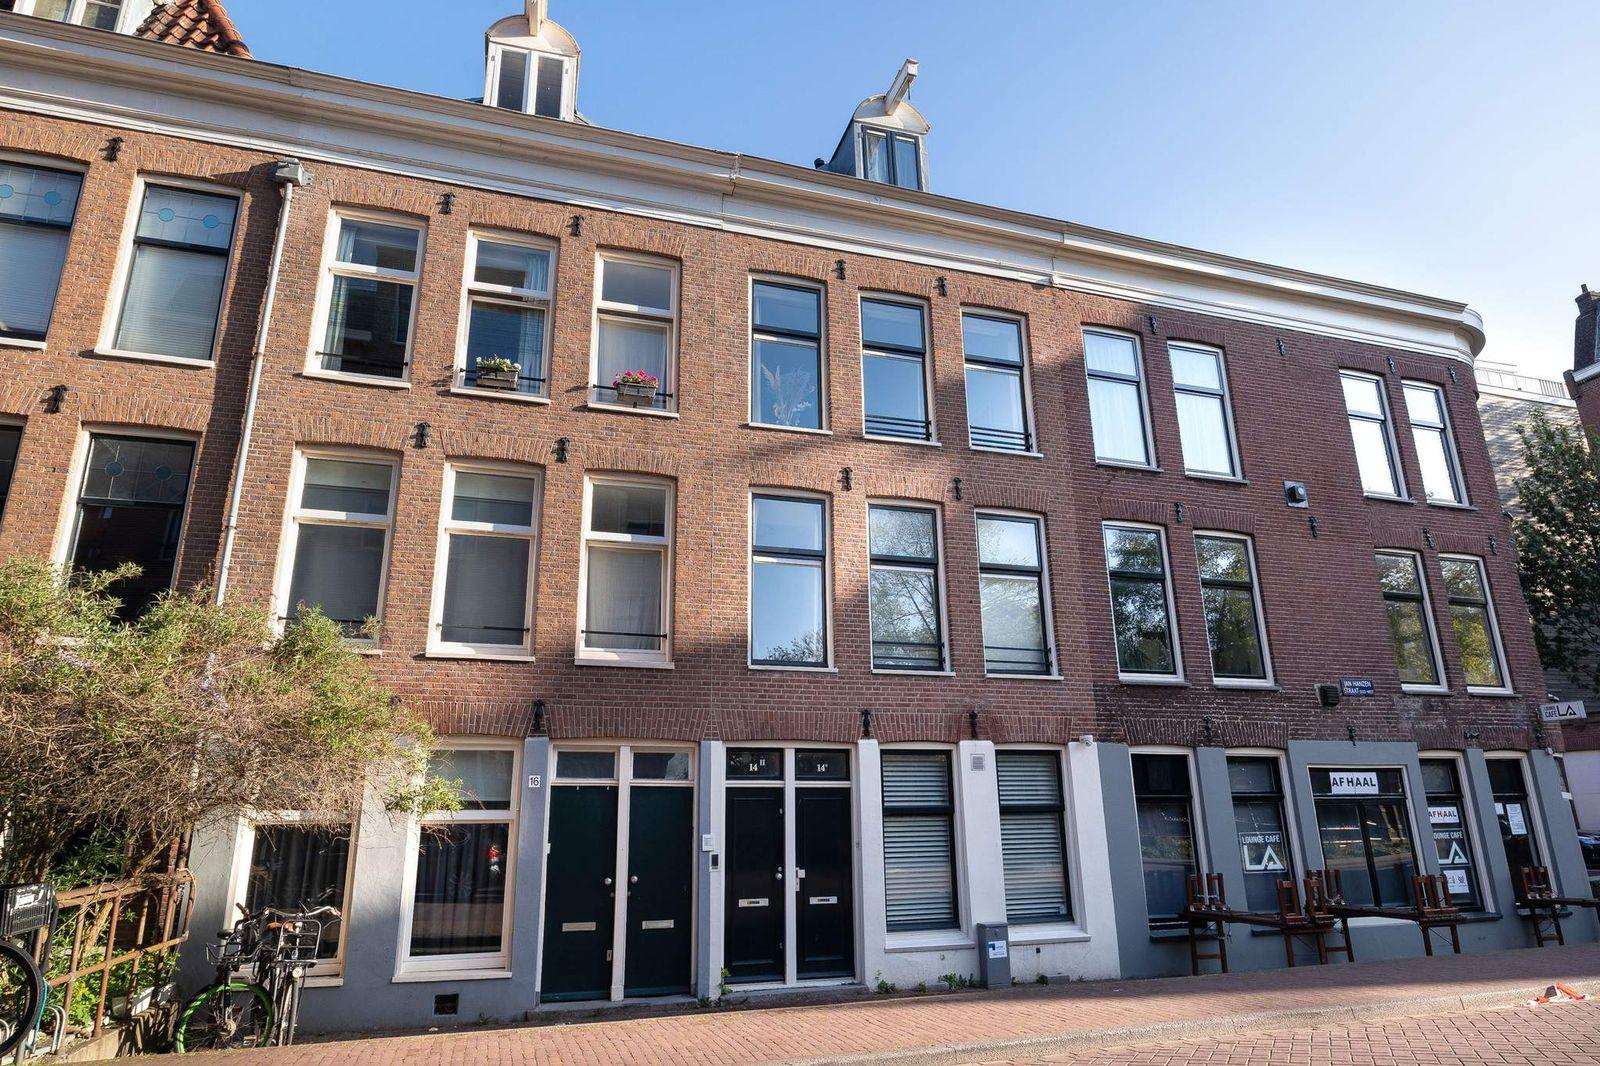 Jan Hanzenstraat 14-hs, Amsterdam